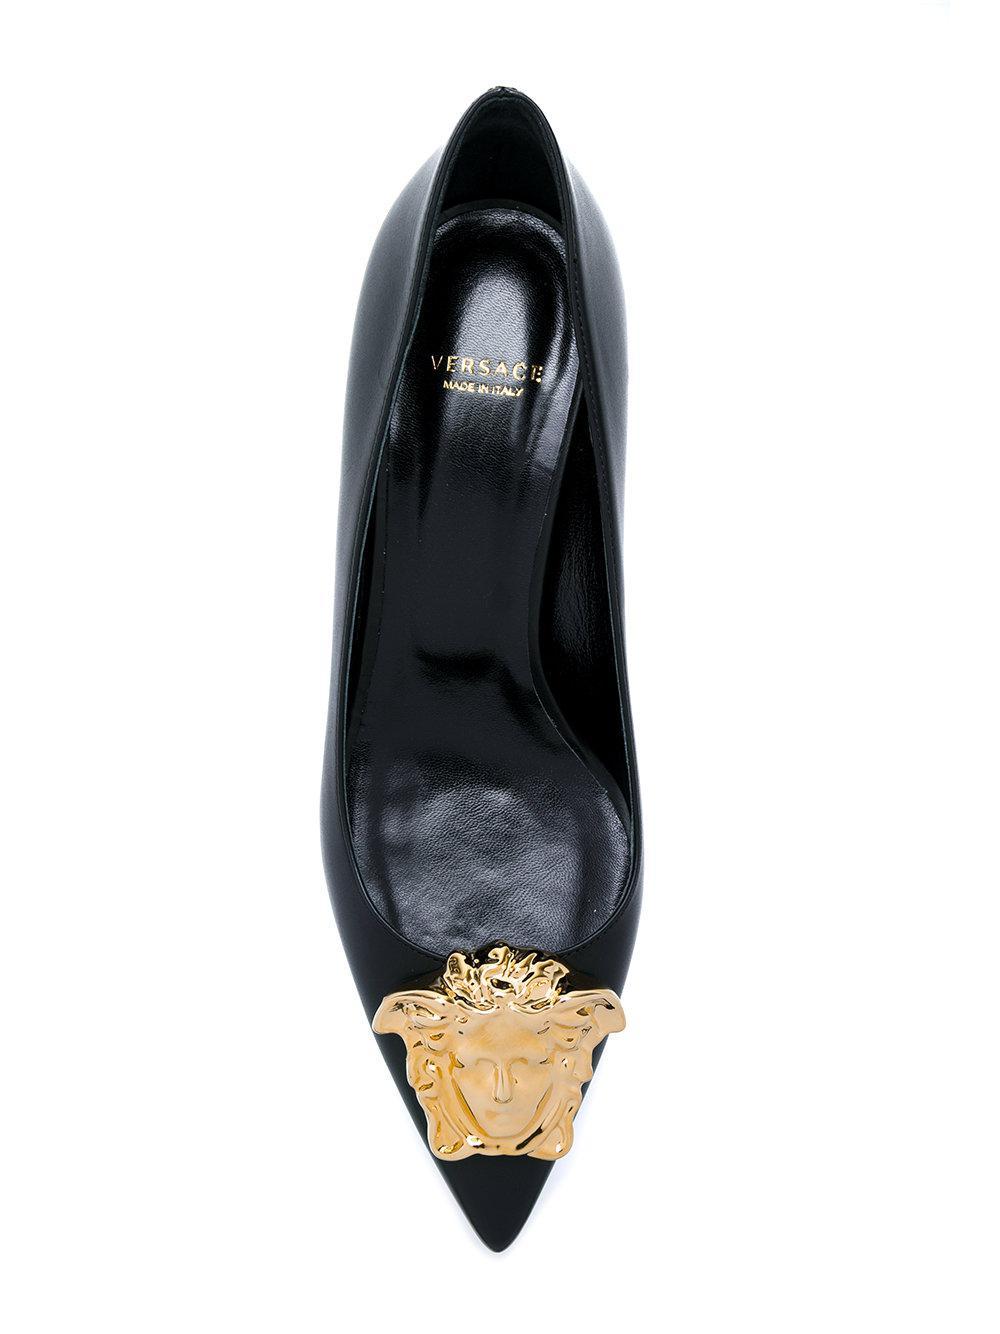 405404ecb95 Lyst - Versace Medusa Palazzo Pumps in Black